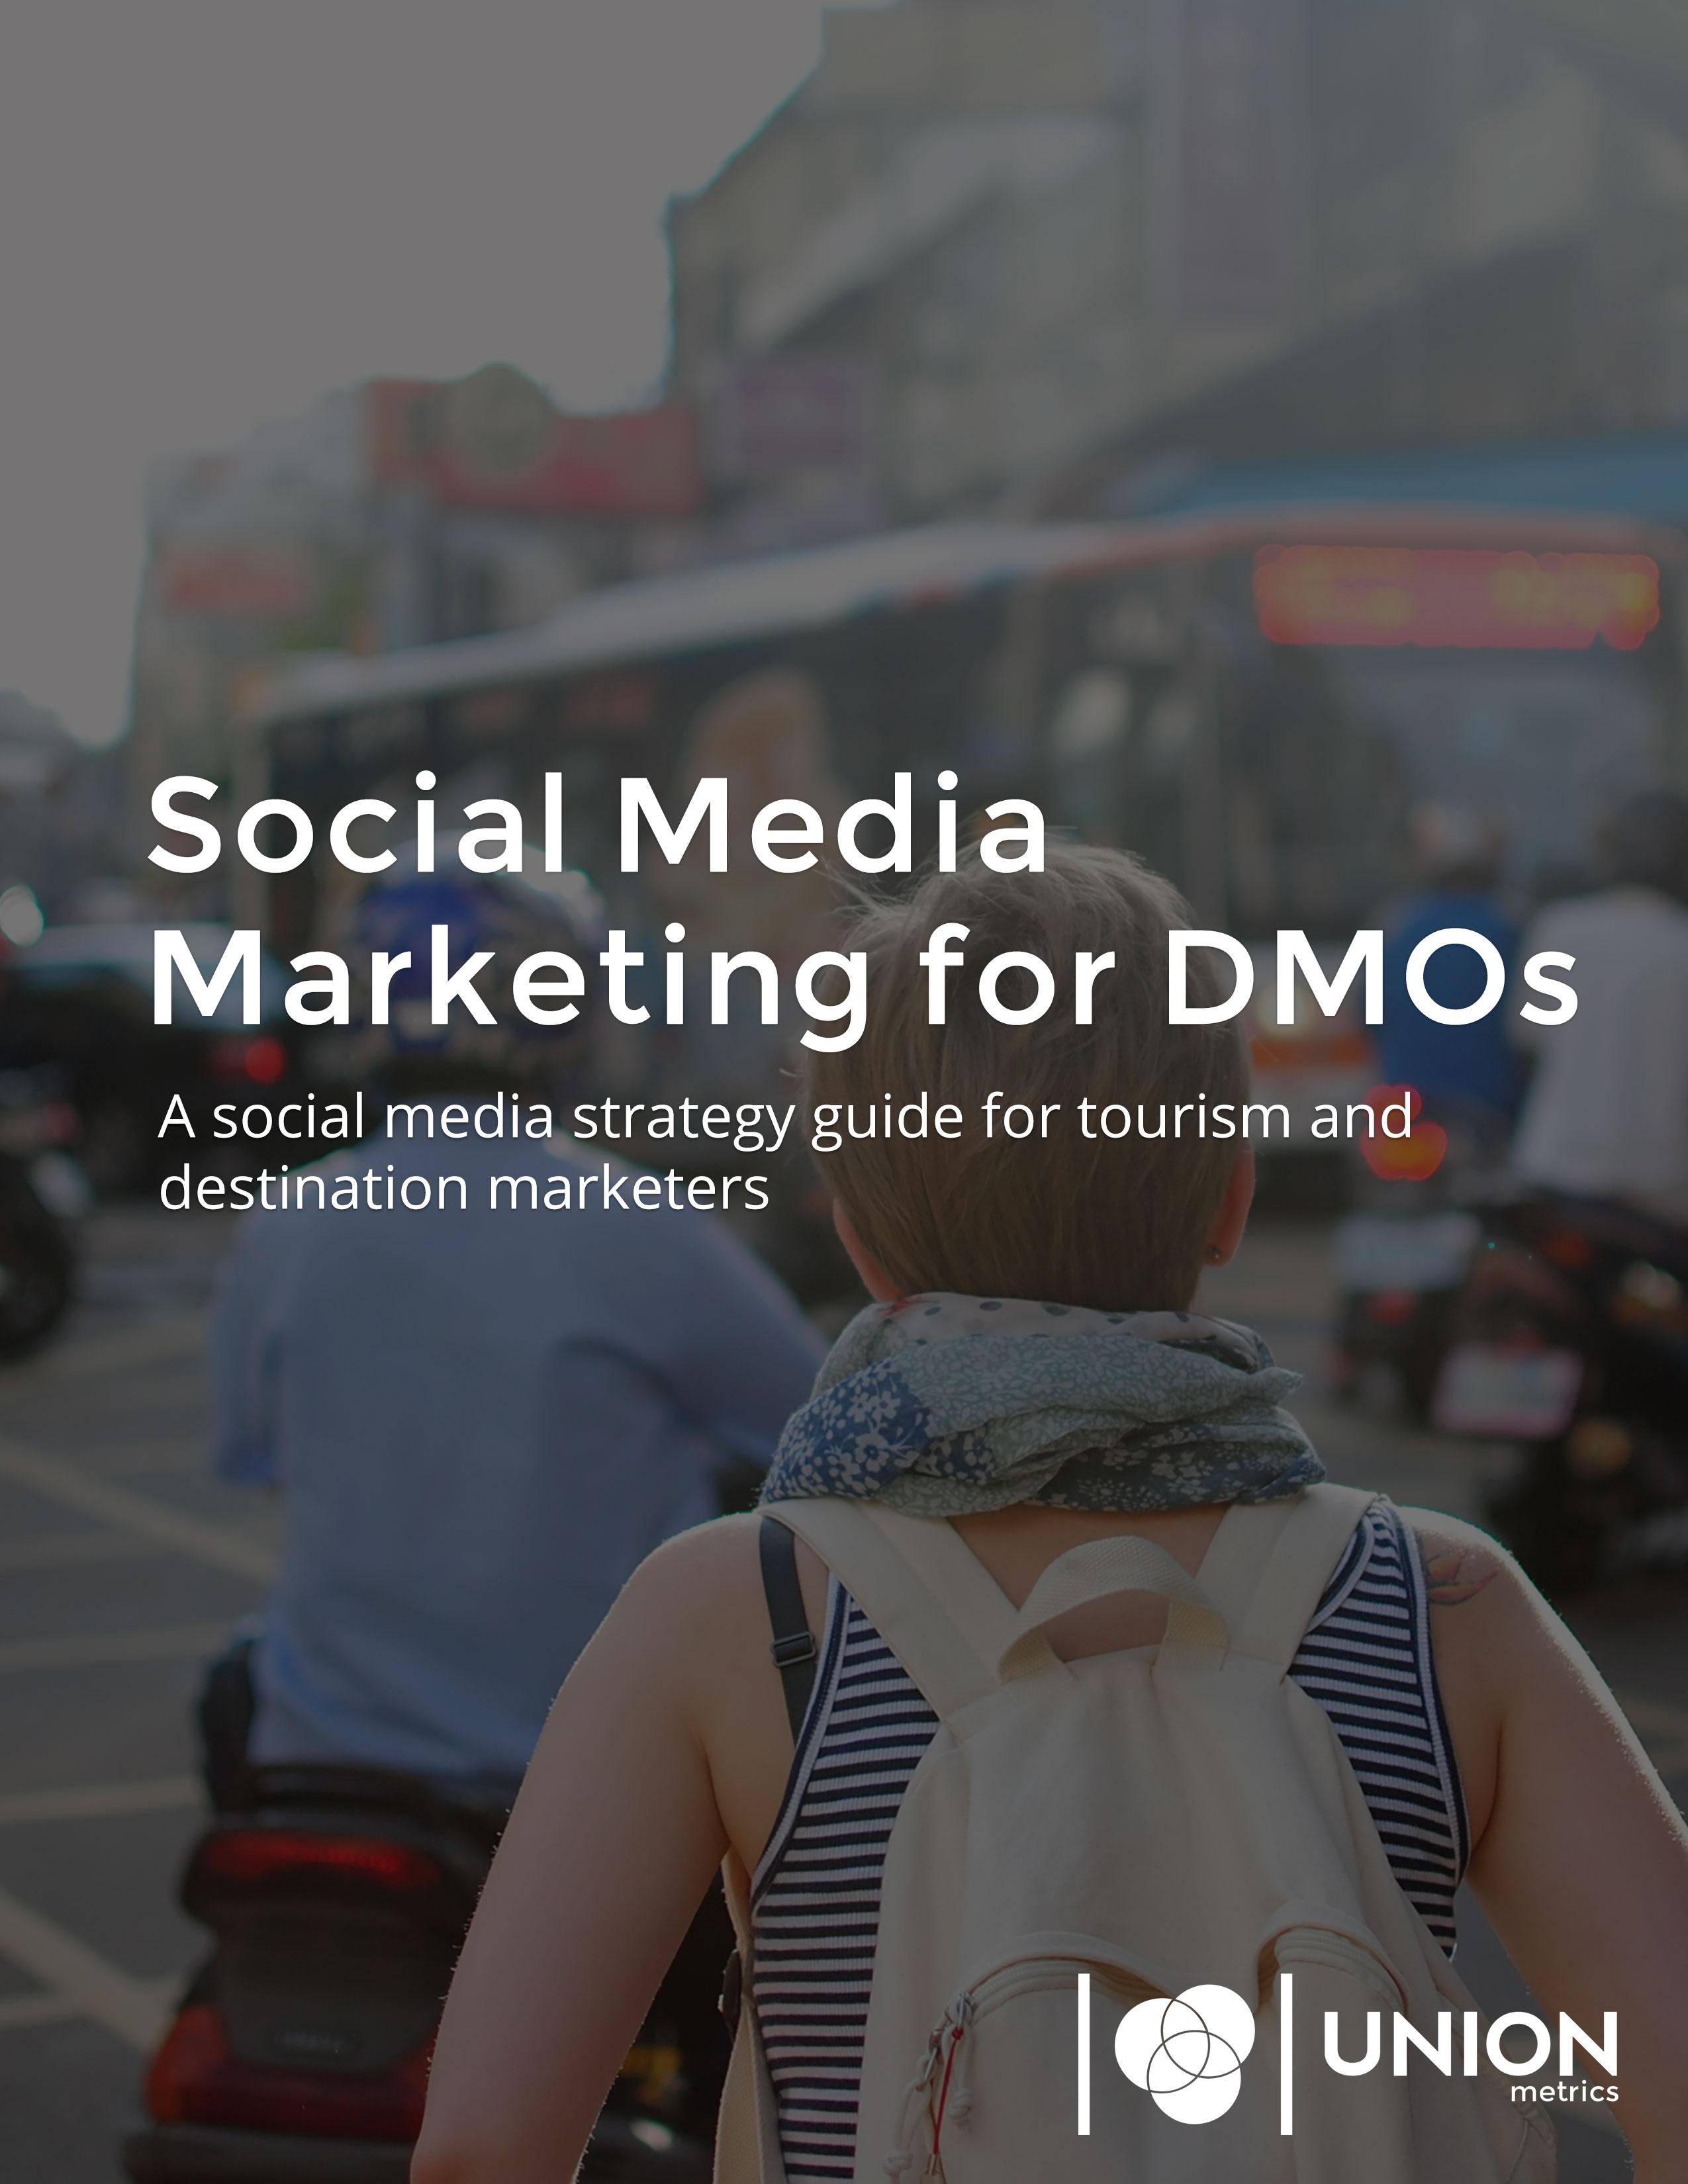 Social media for DMOs